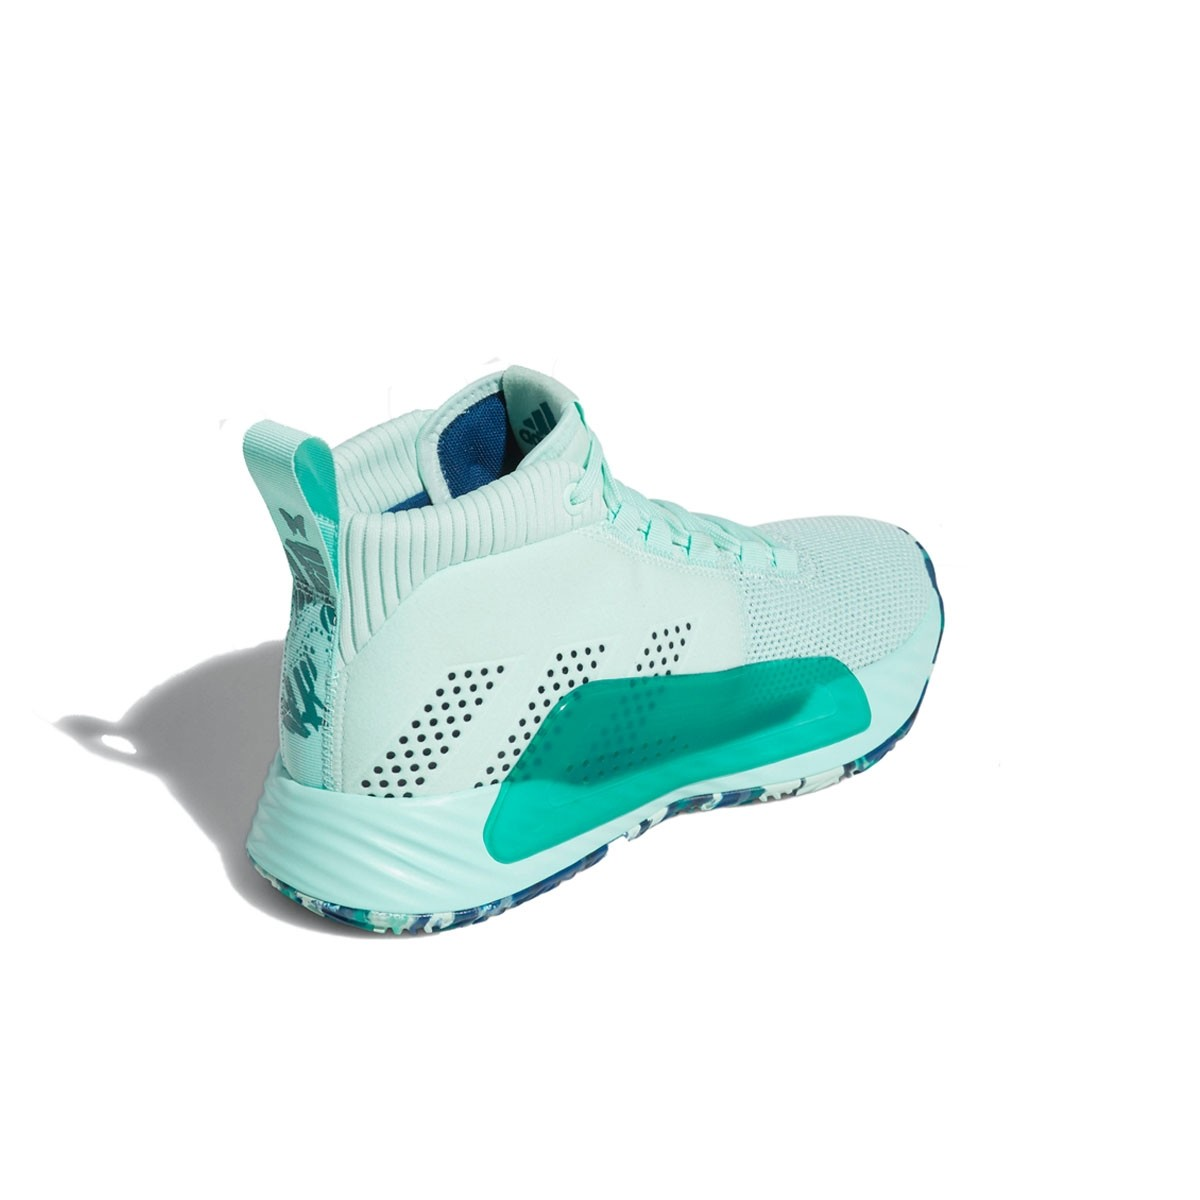 fa30f8395ab Buy ADIDAS Dame 5  Suga Gee  Basketball shoes   sneakers